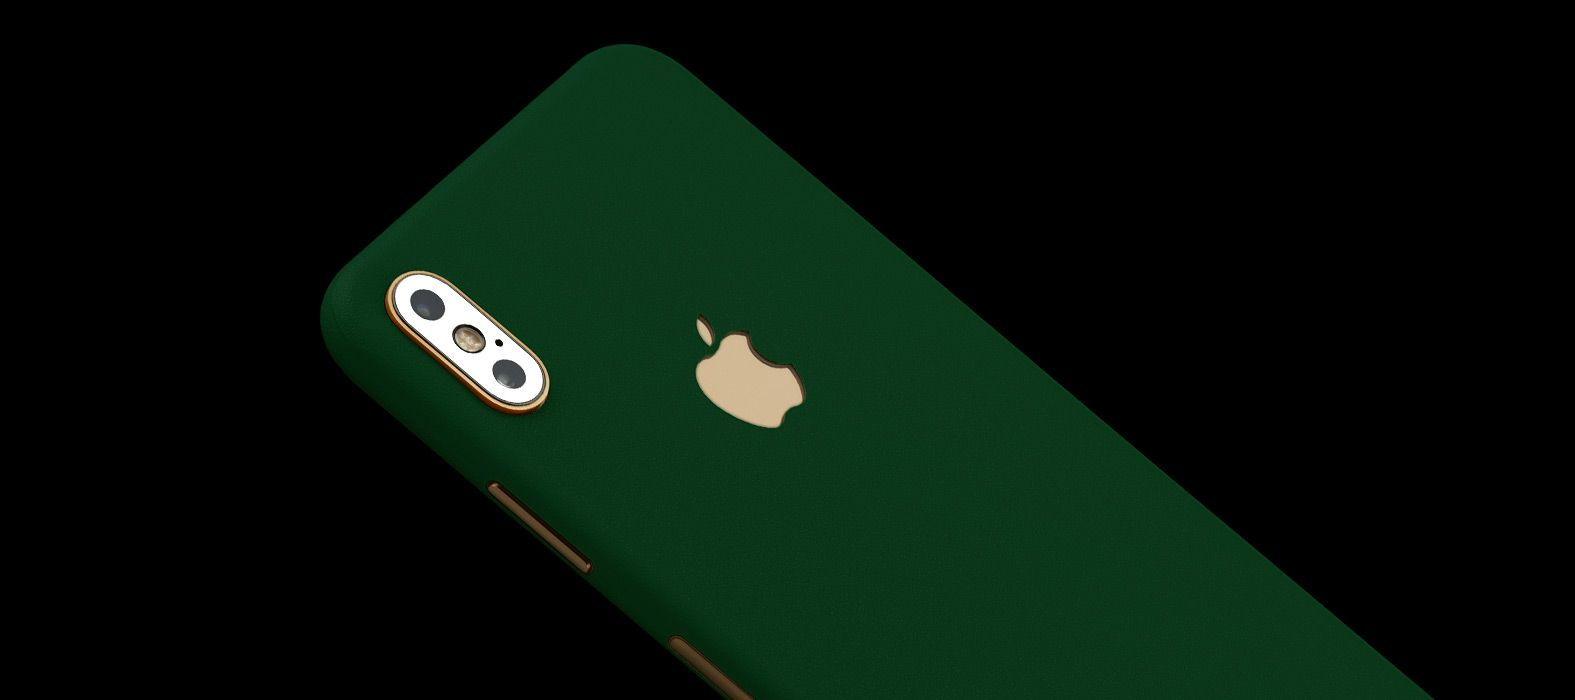 iPhone XS Green Sandstone Skins